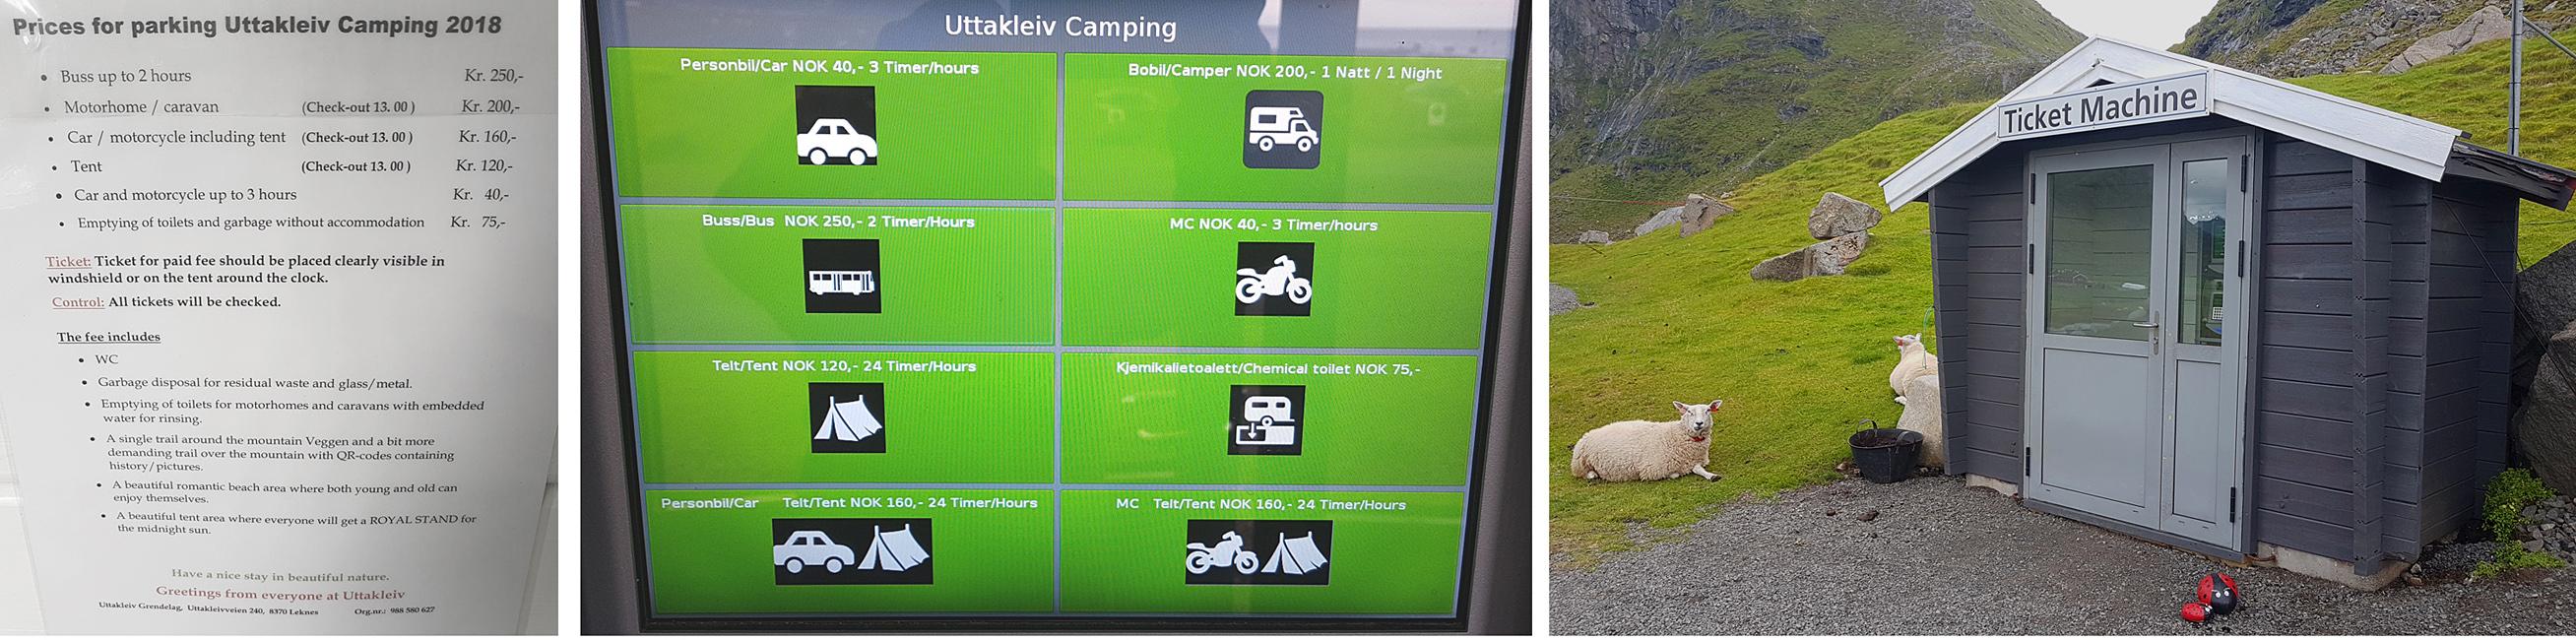 camping at uttakleiv